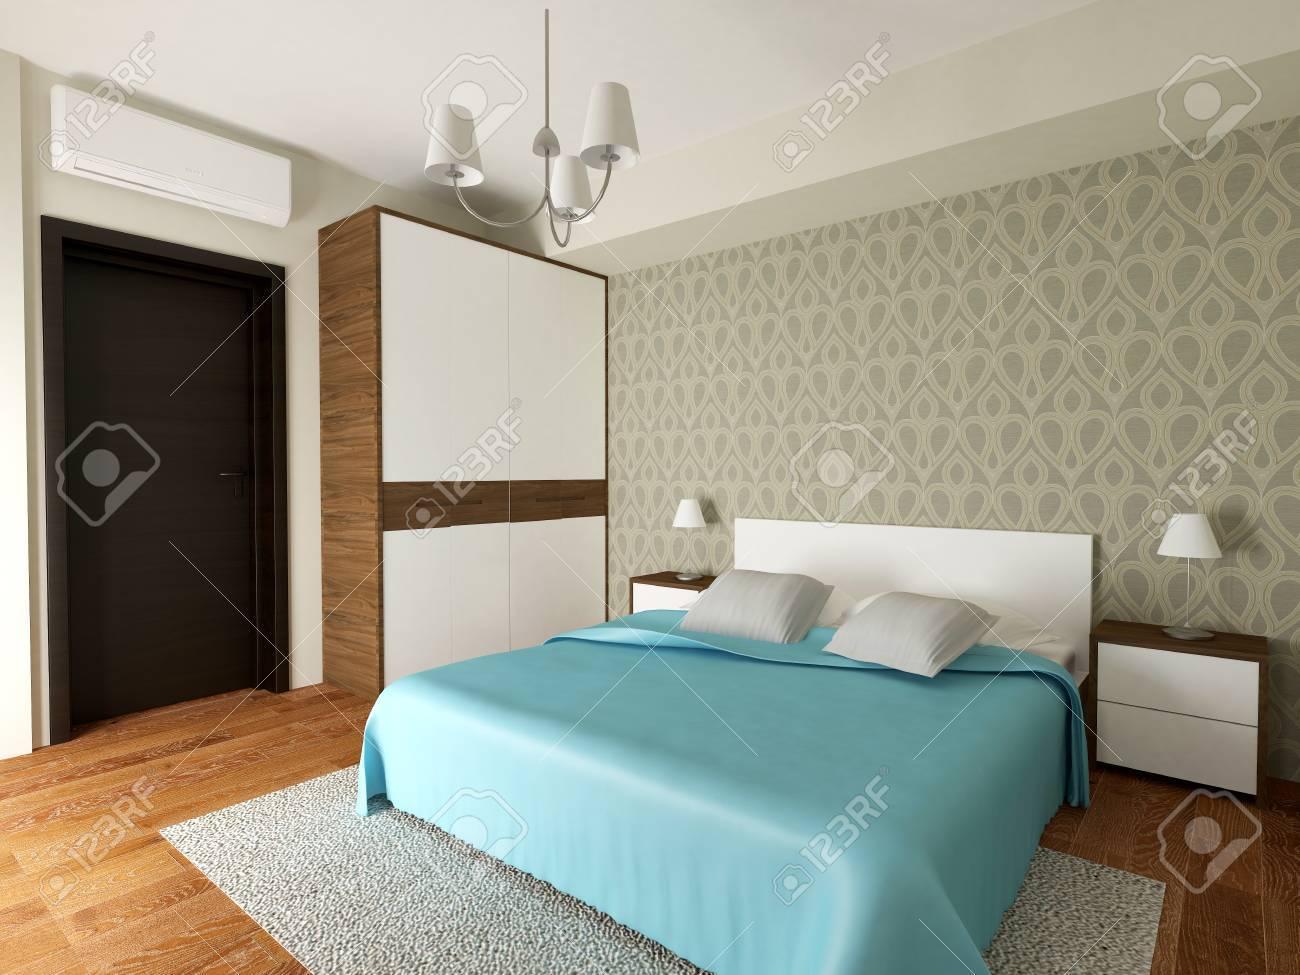 modern bedroom interior 3d render stock photo 45868278